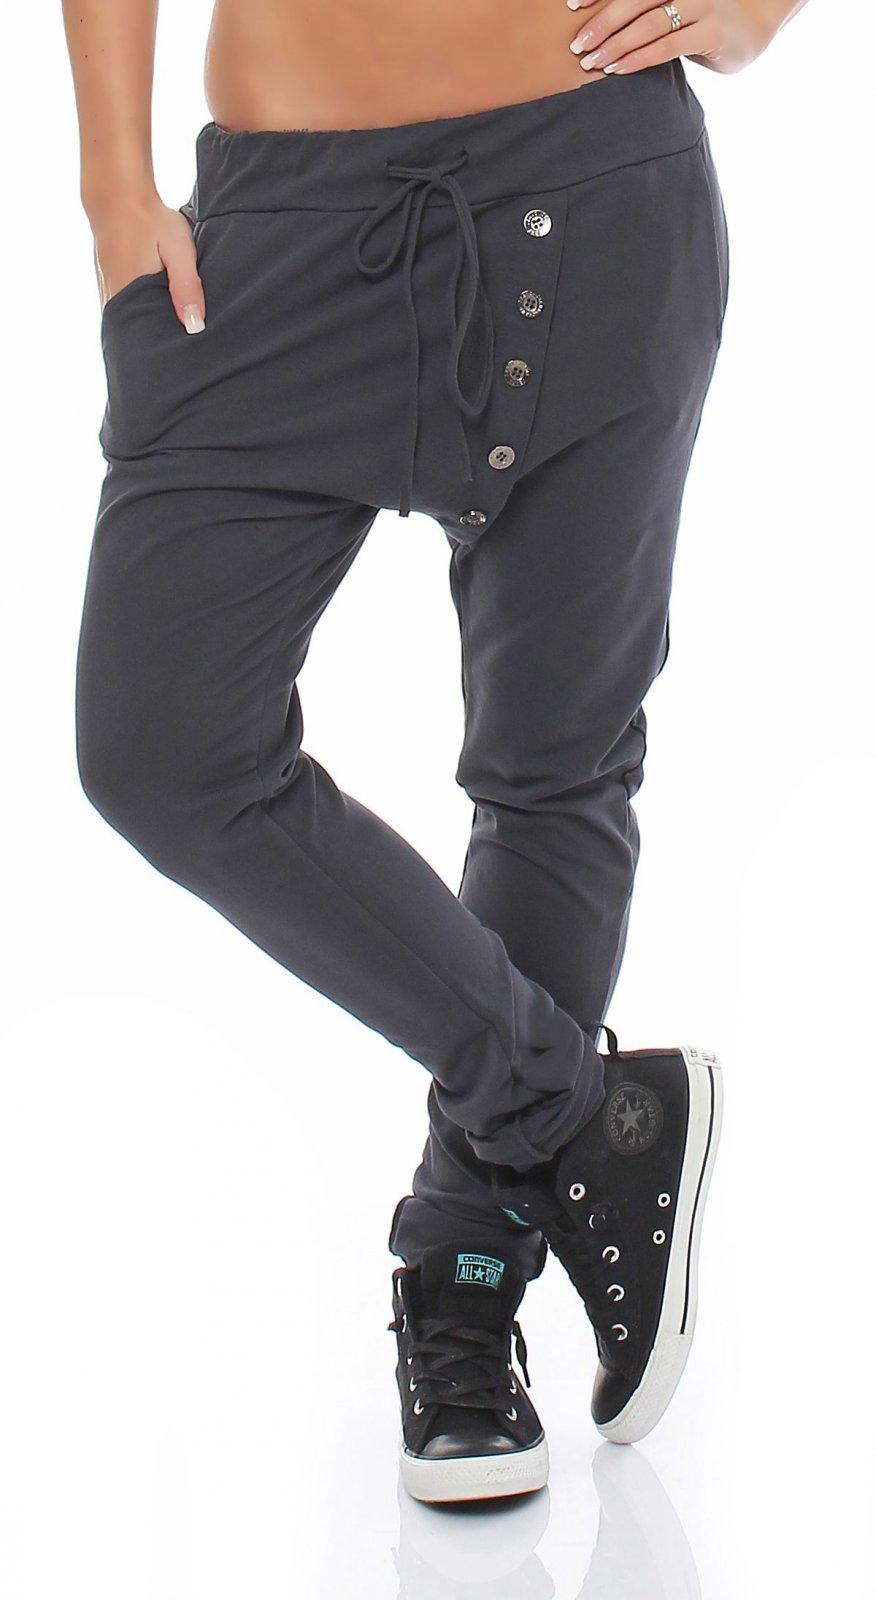 Baggy Sweatpants For Girls Women Pants Sweat Pant...